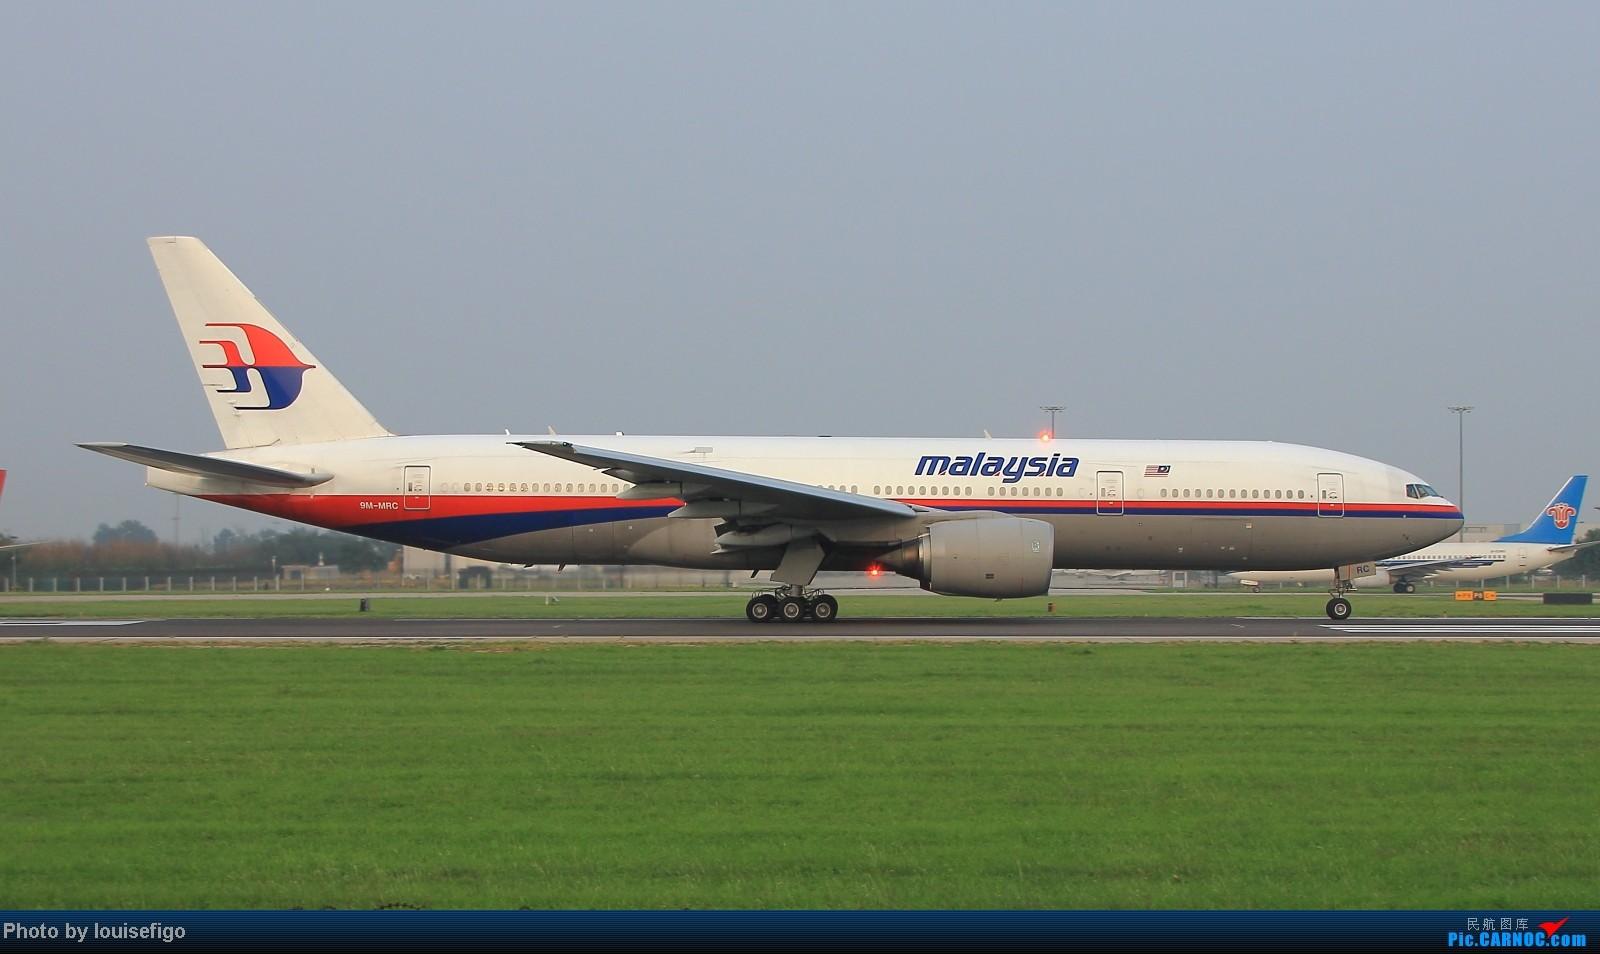 Re:[原创]闲来无事天气闷,发点冷饭自娱乐!!!PEK西跑的降落杂图~发到哪儿是哪儿啊!随心情! BOEING 777-200 9M-MRC 北京首都国际机场